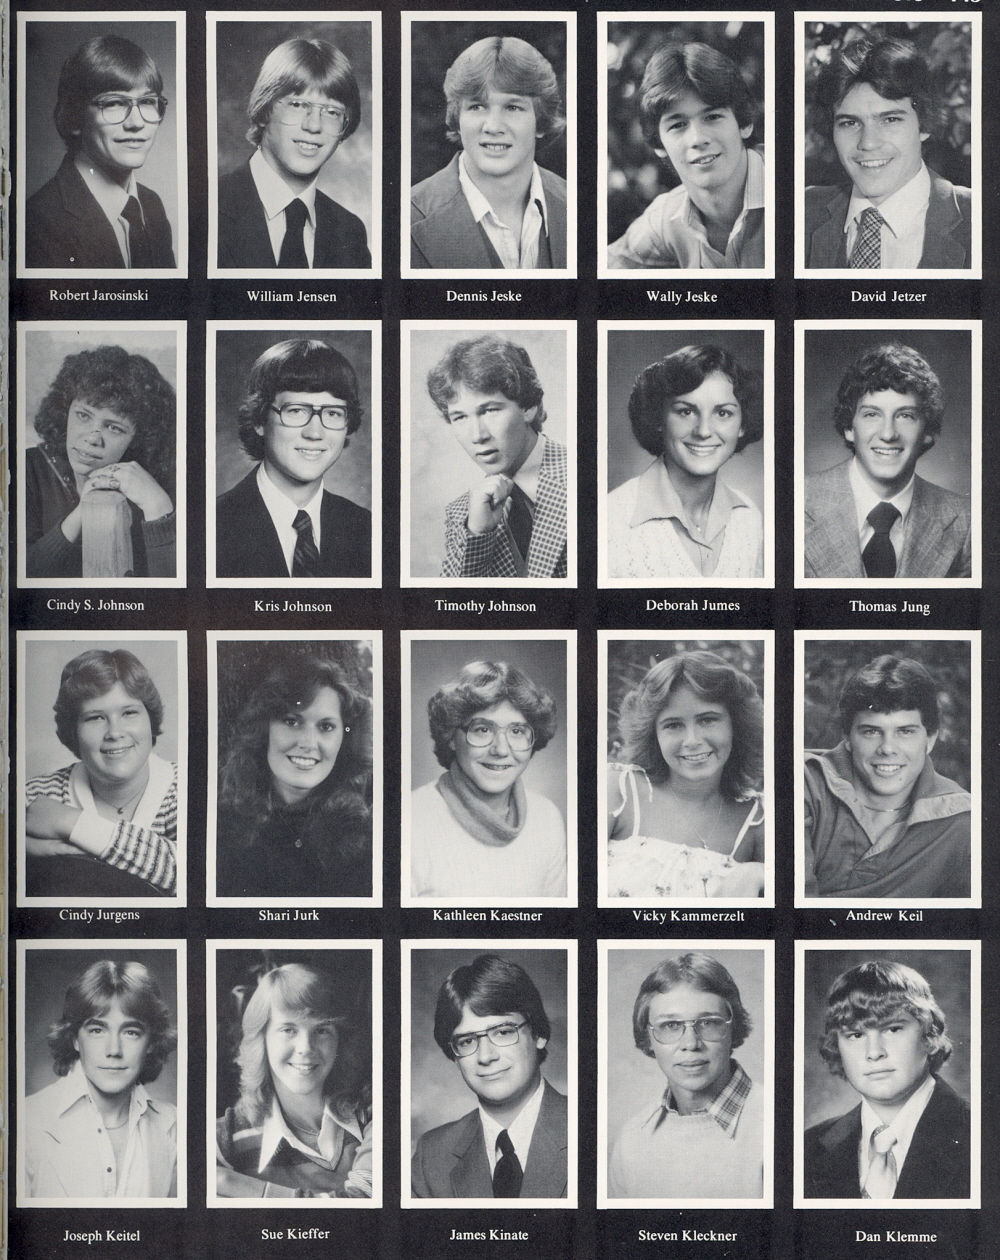 Astonishing 1980 Sheboygan North High School Yearbook Hairstyles For Men Maxibearus